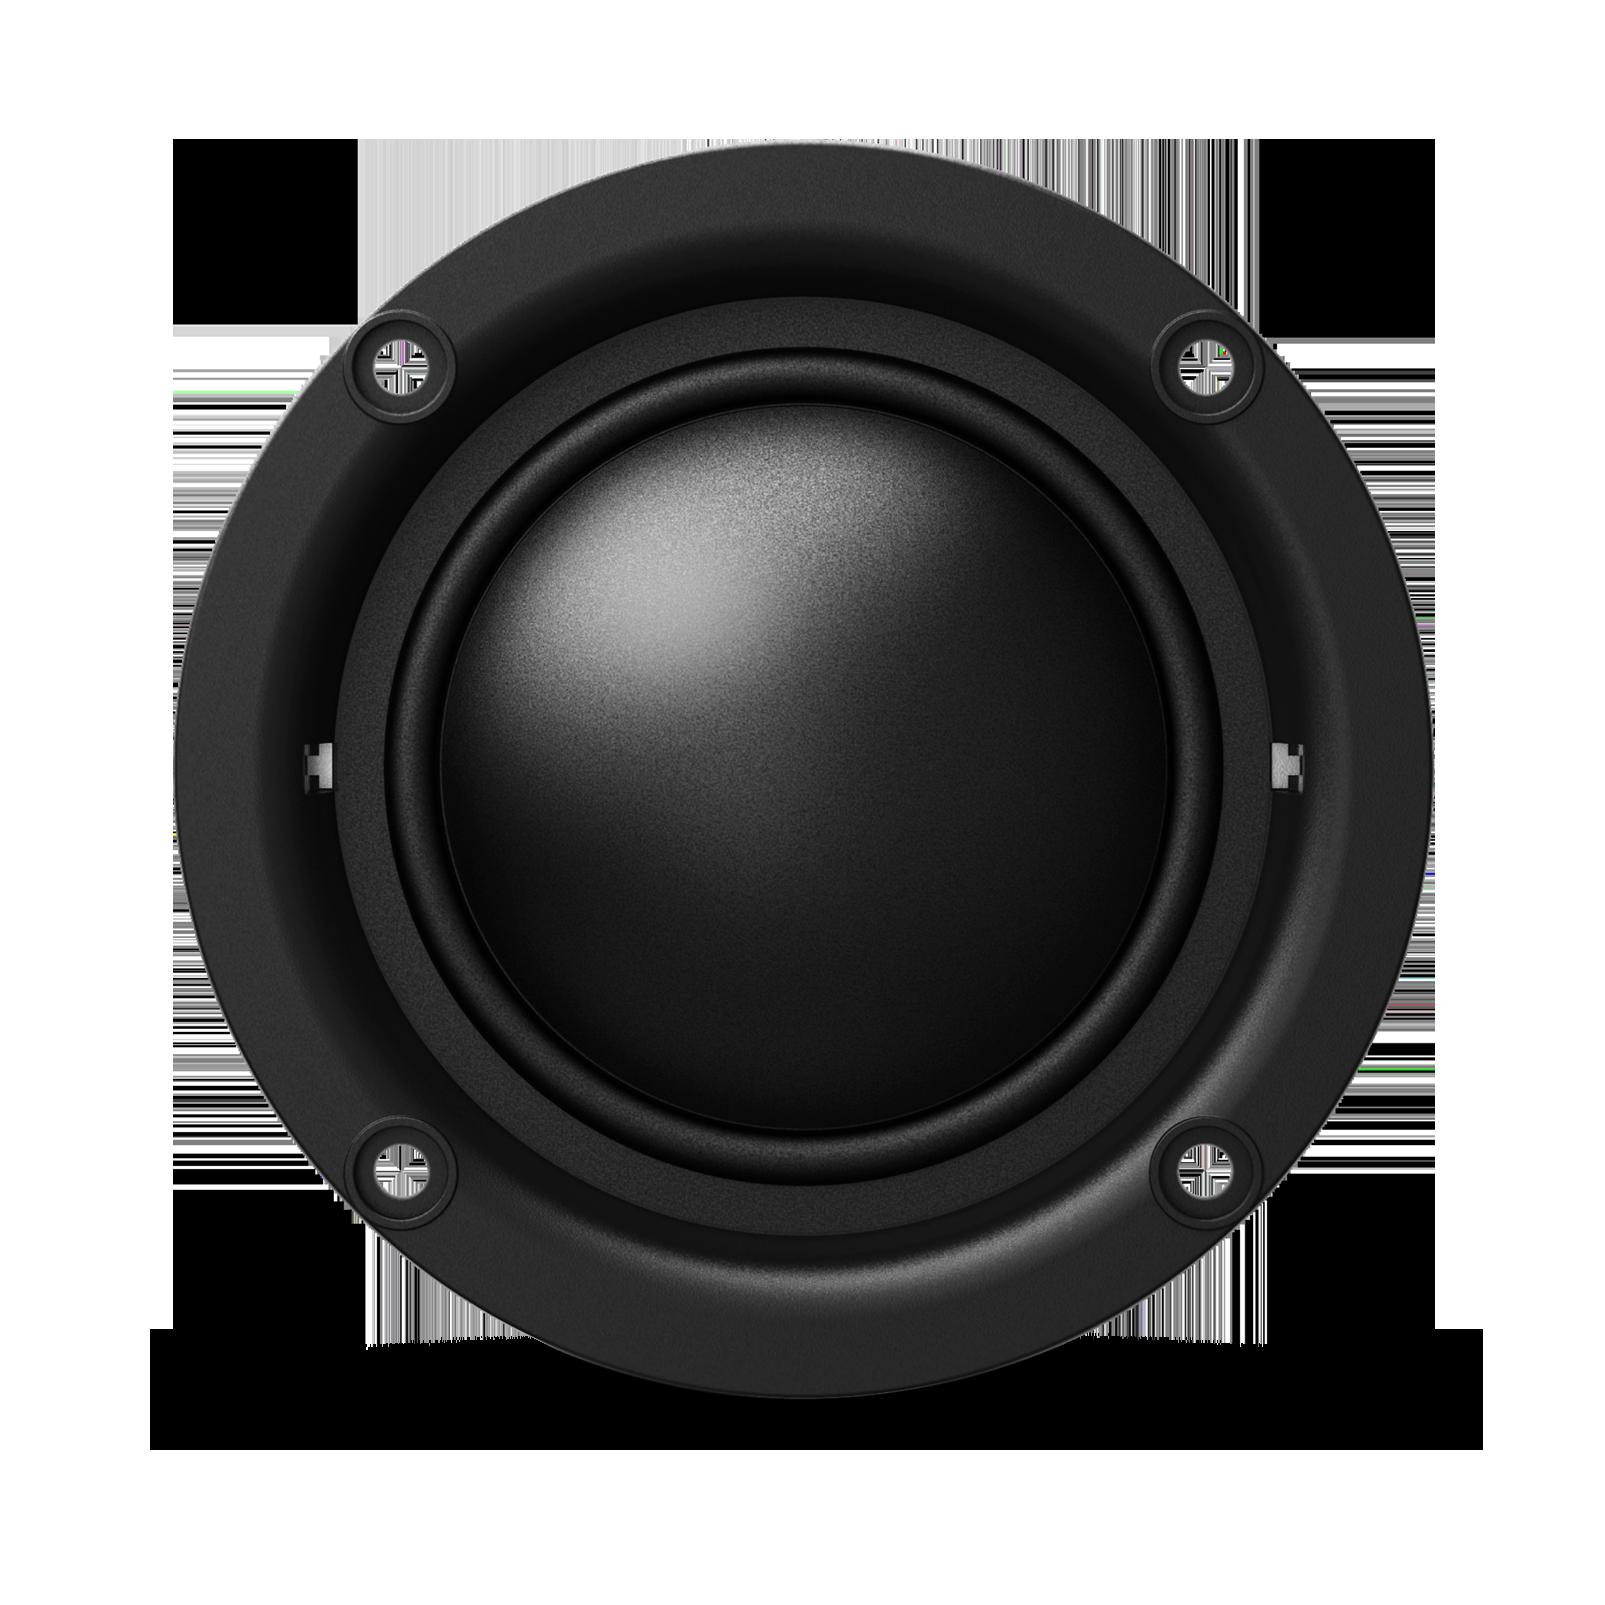 "KAPPA 20MX - Black - Kappa 20mx—2"" (50mm) car audio dome midrange w/ bandpass crossover enclosure - Detailshot 4"